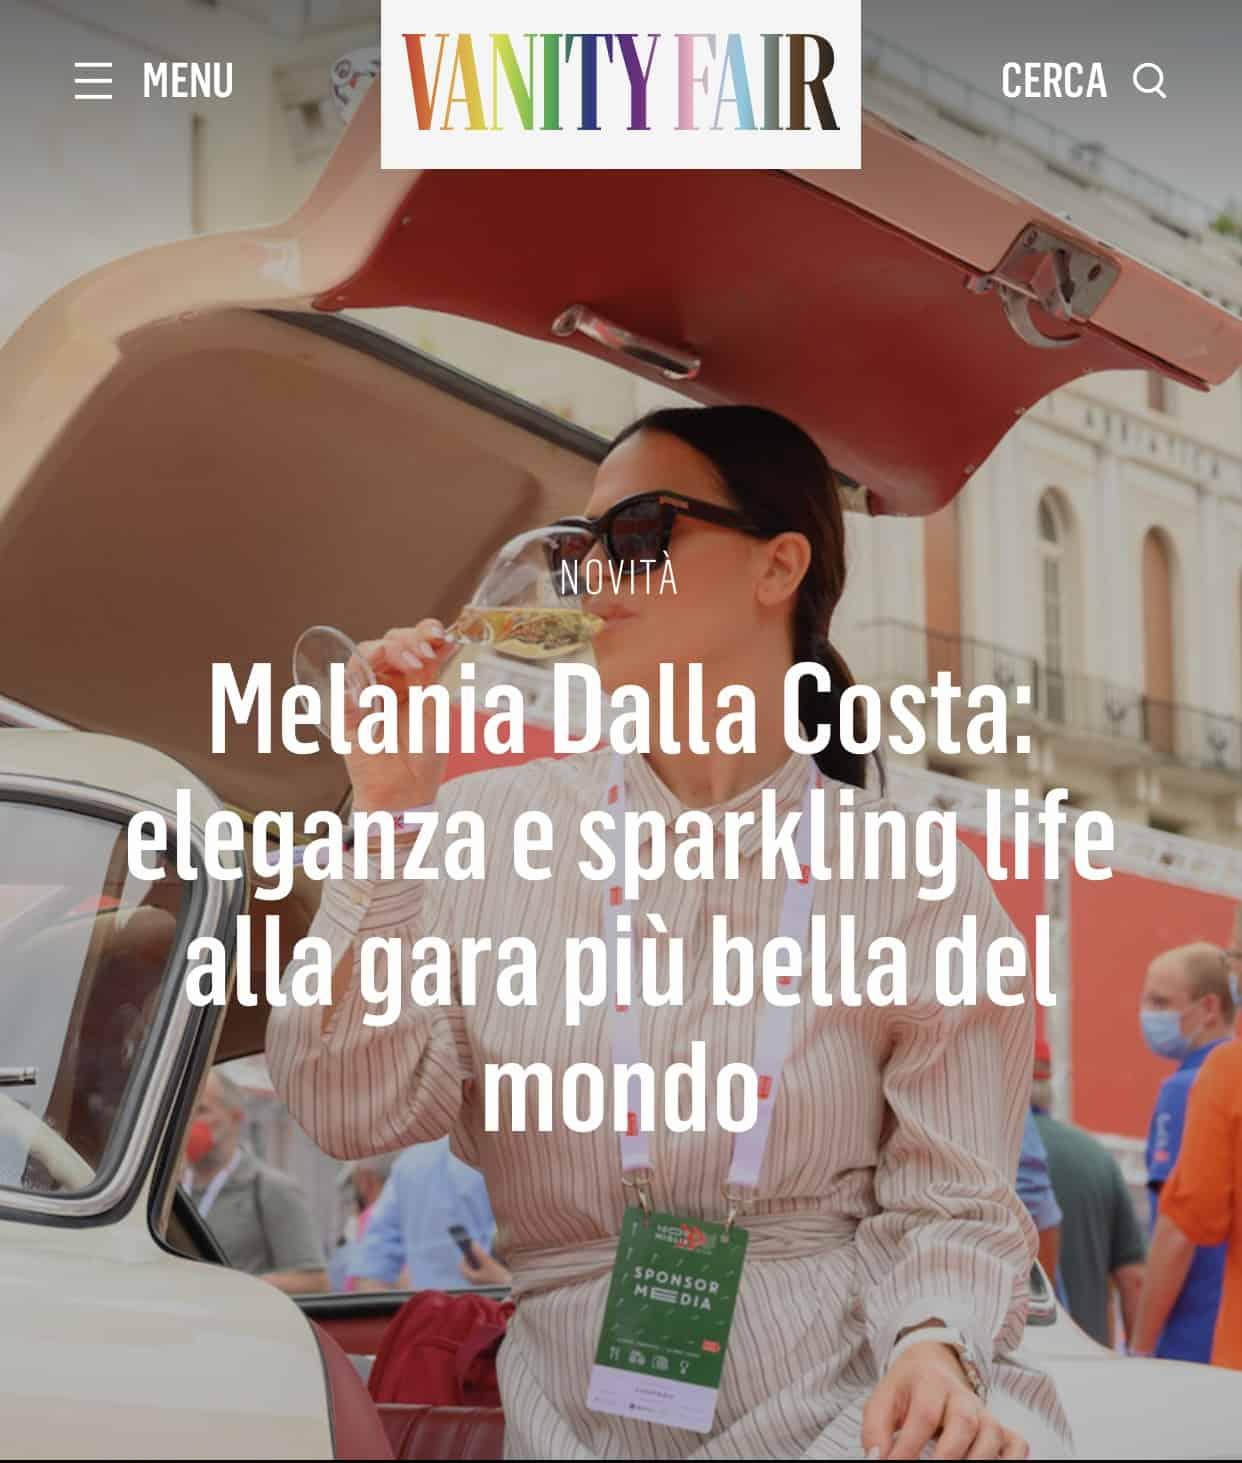 Melania Dalla Costa Vanity Fair 1000 Miglia